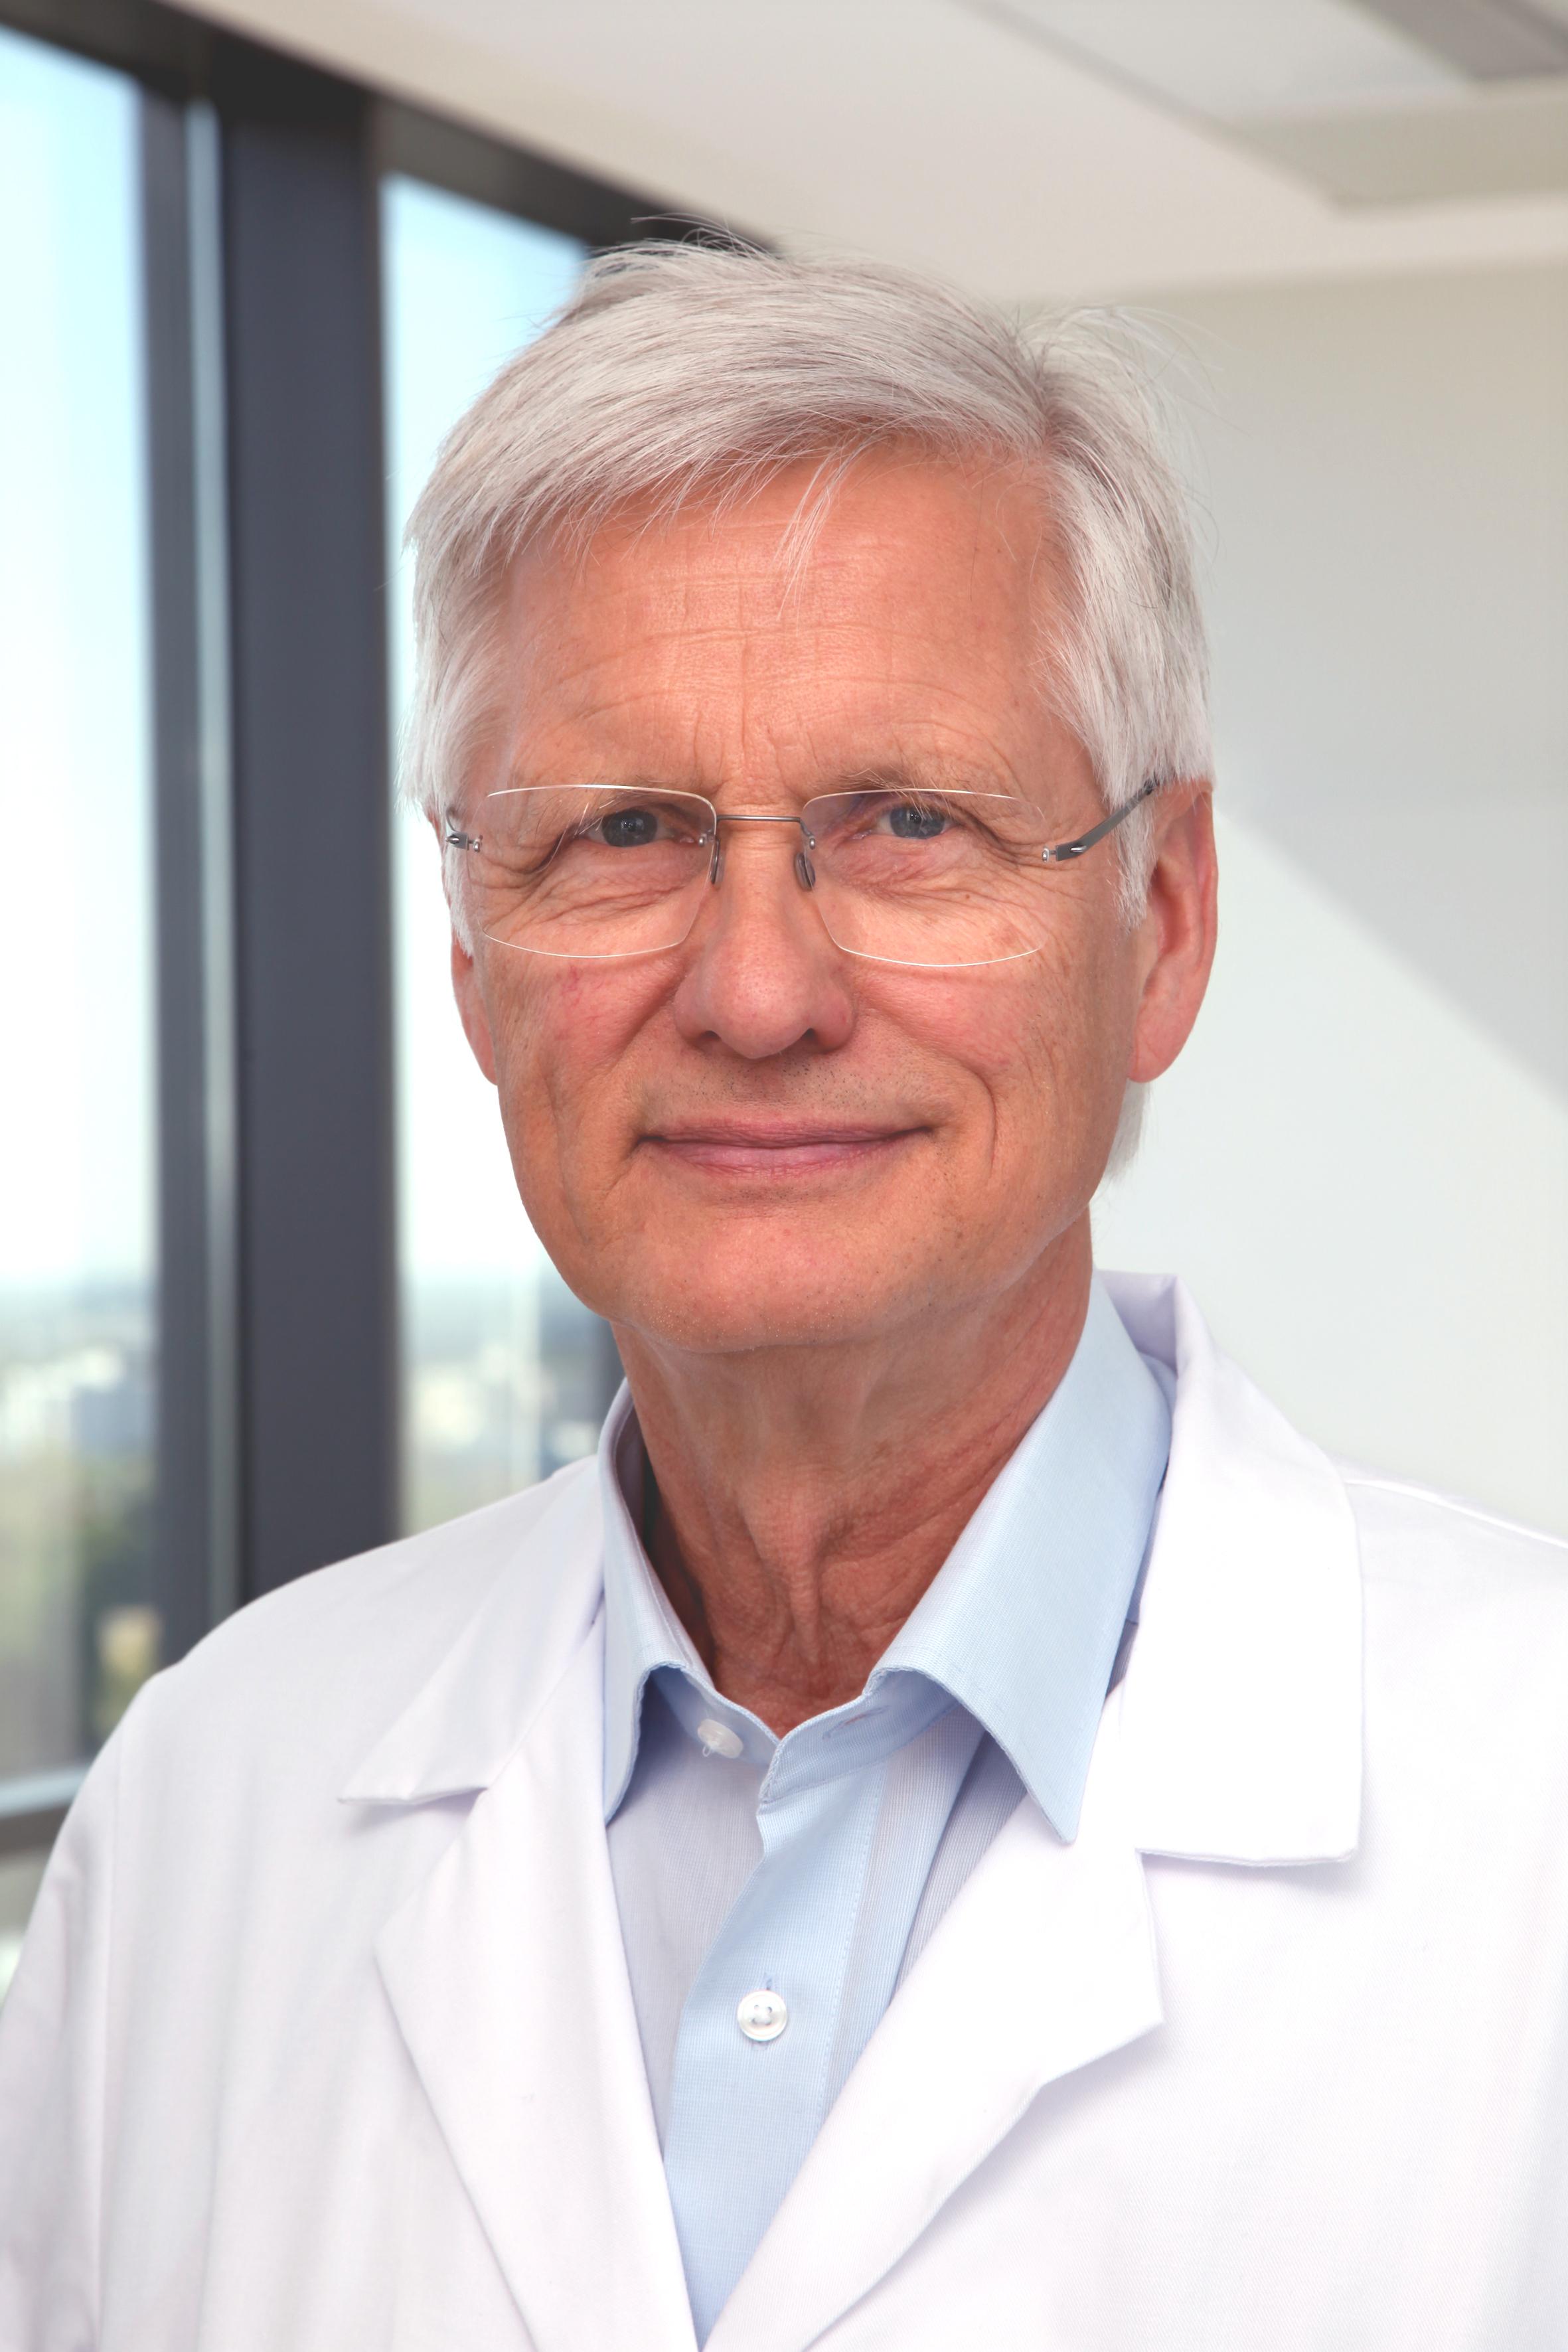 Ганс-Рудольф Тиннеберг, гинеколог